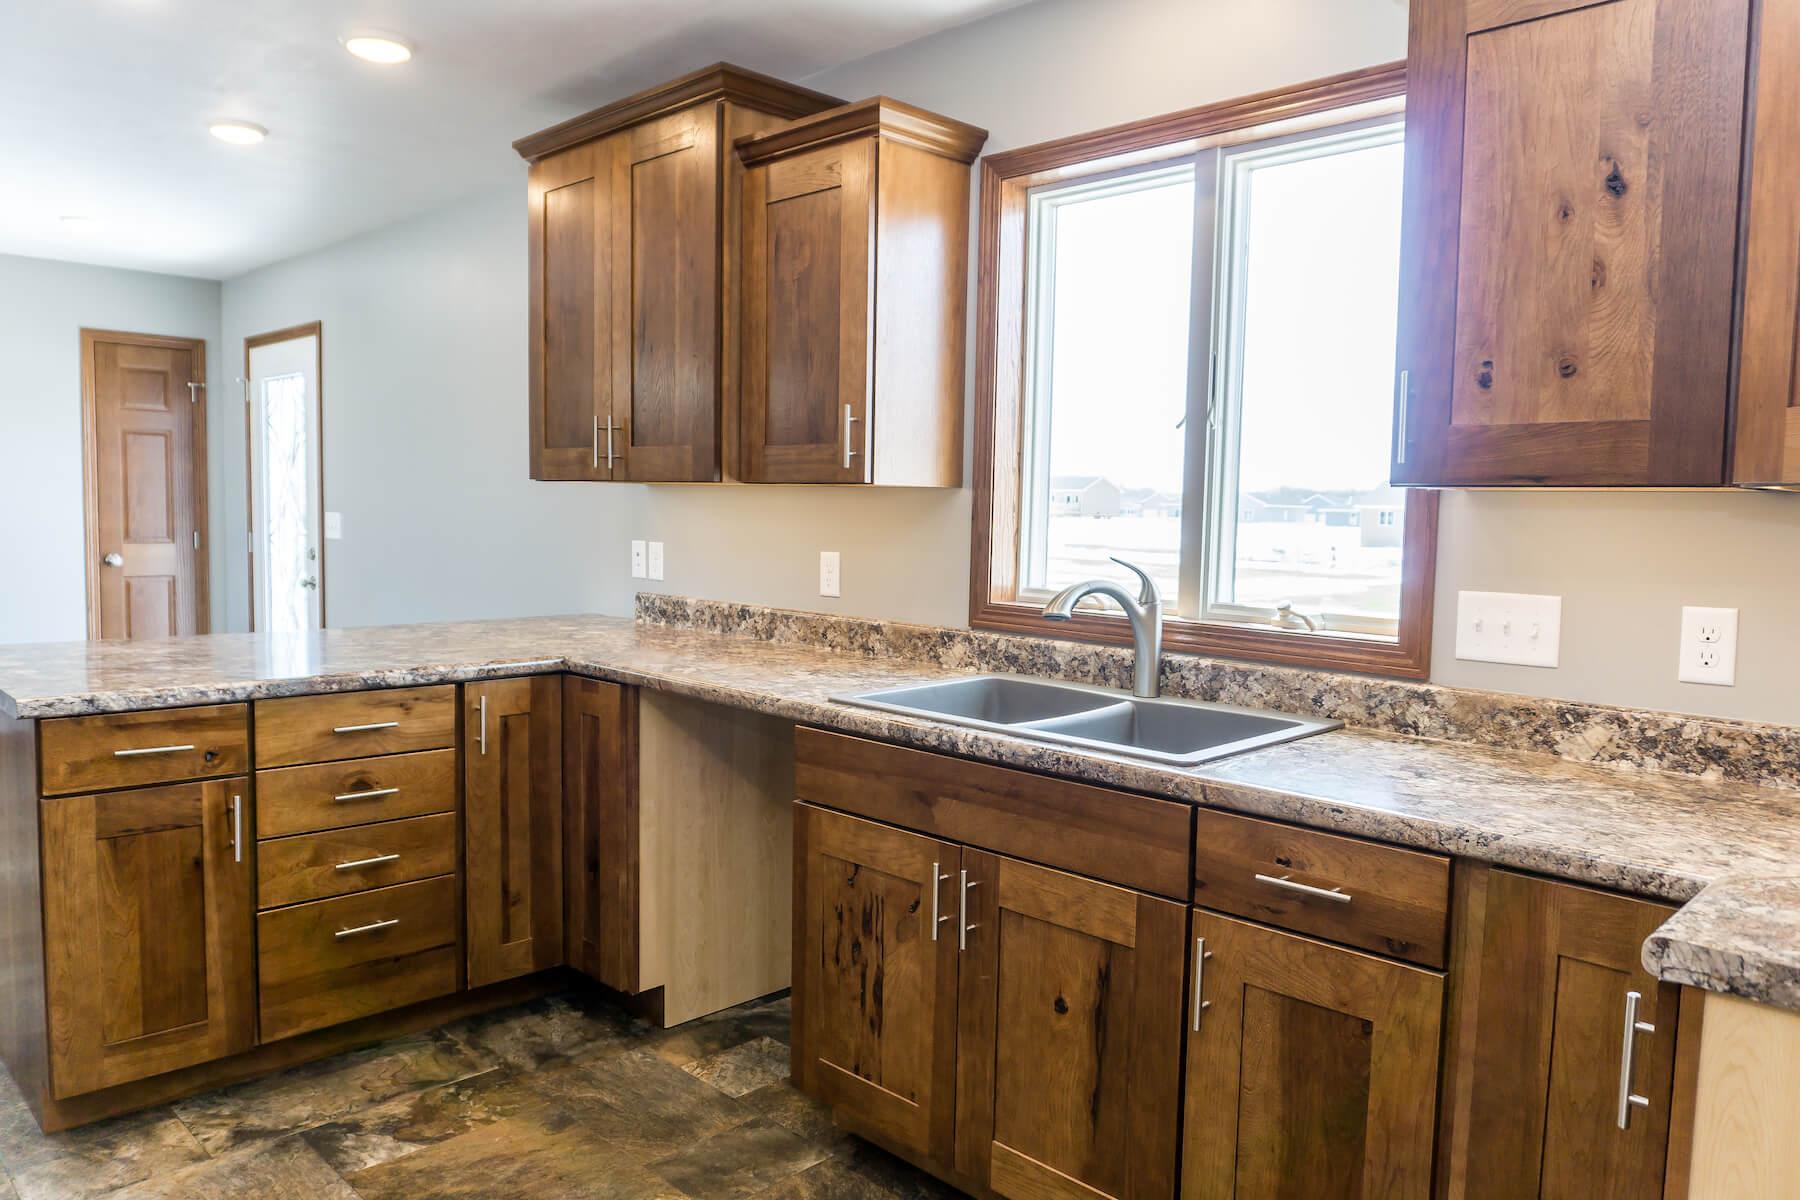 2019-4-12 Kemper Avenue Builders FirstSource Compressed  16.jpg